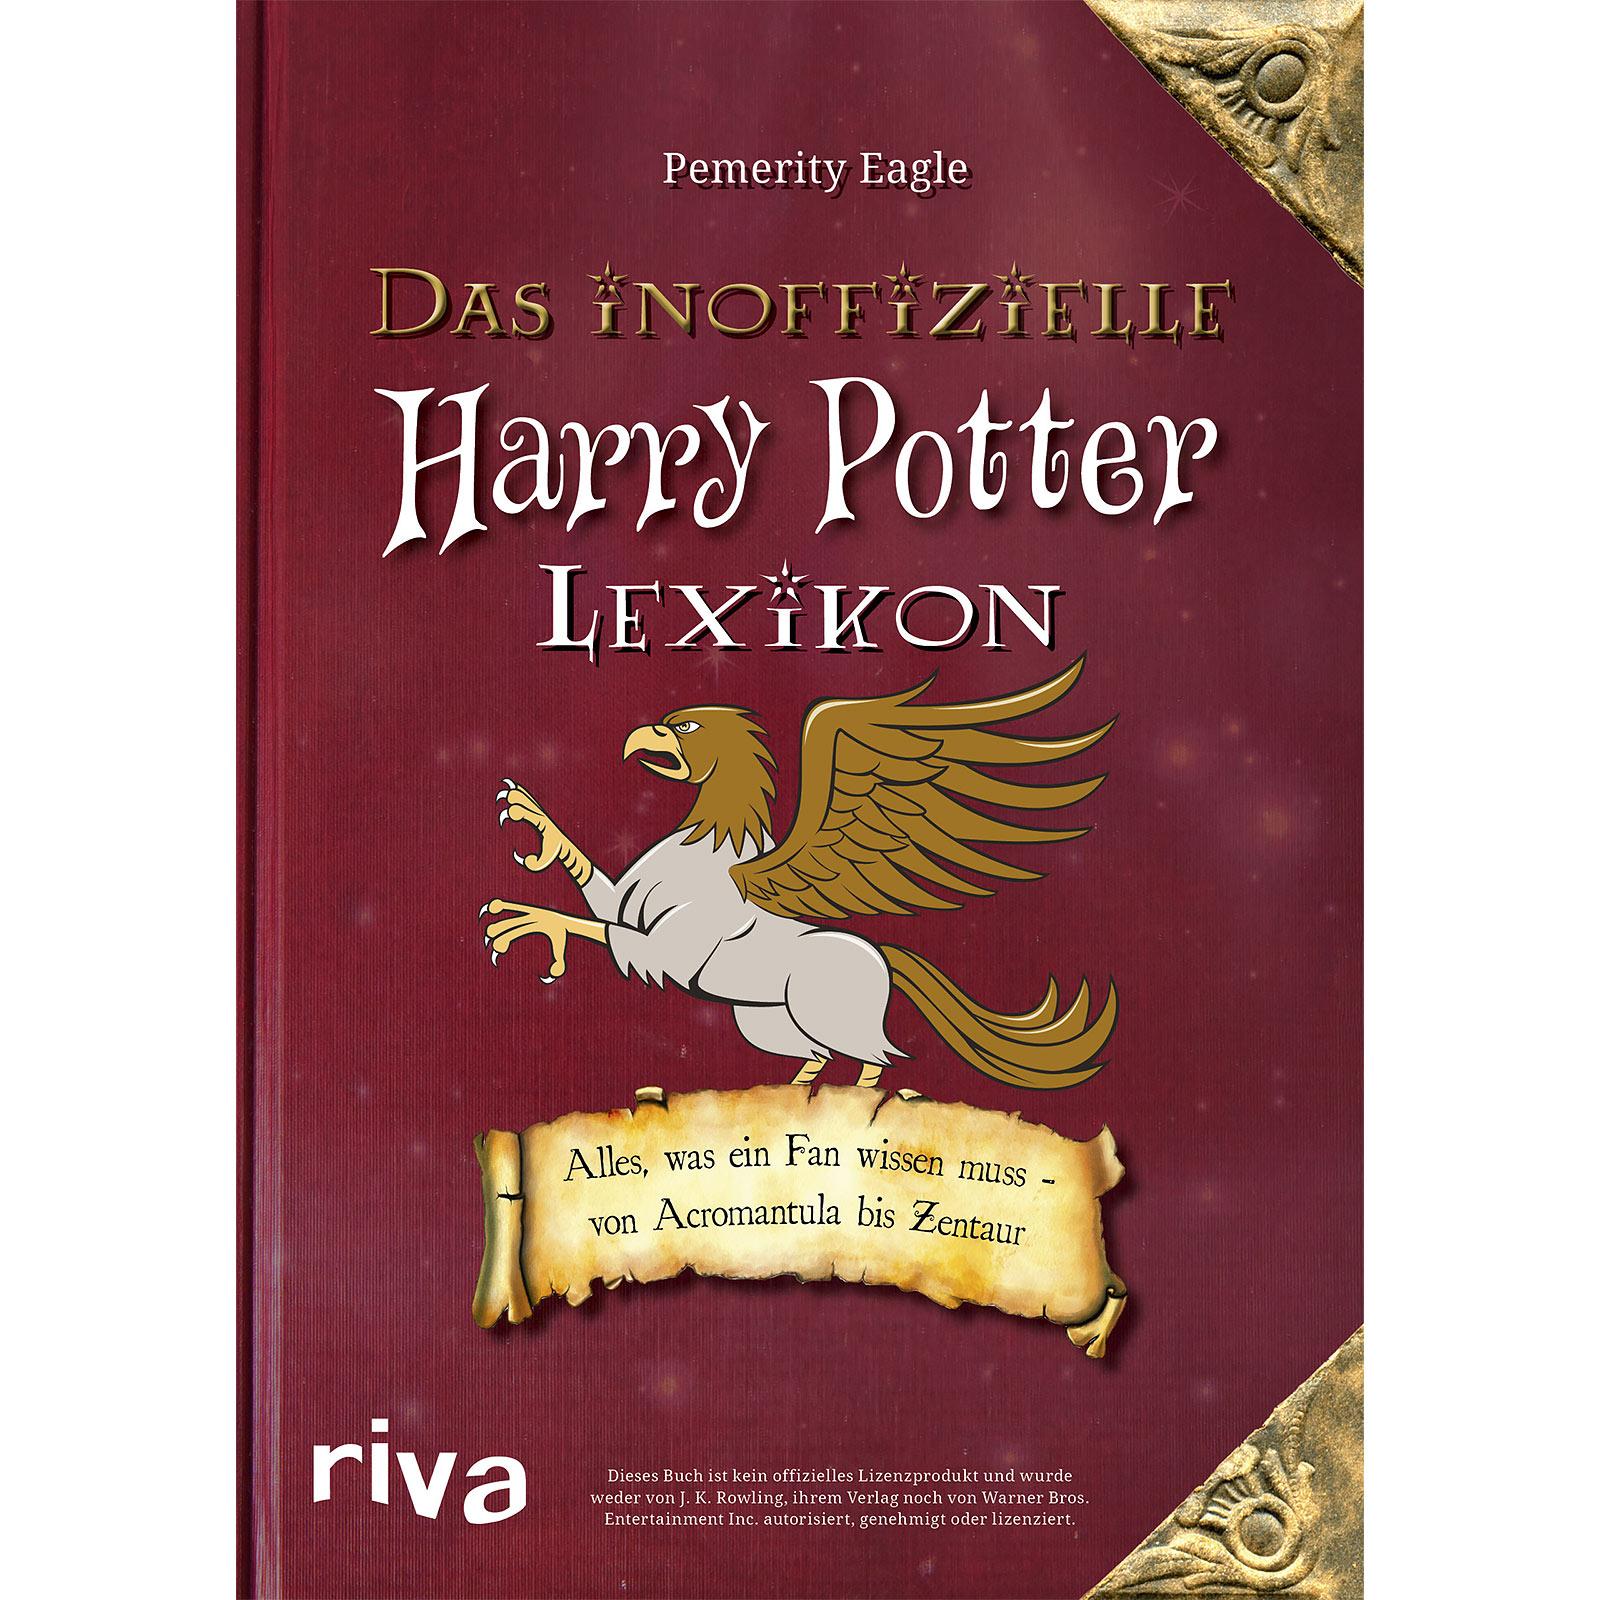 Das inoffizielle Harry Potter Lexikon